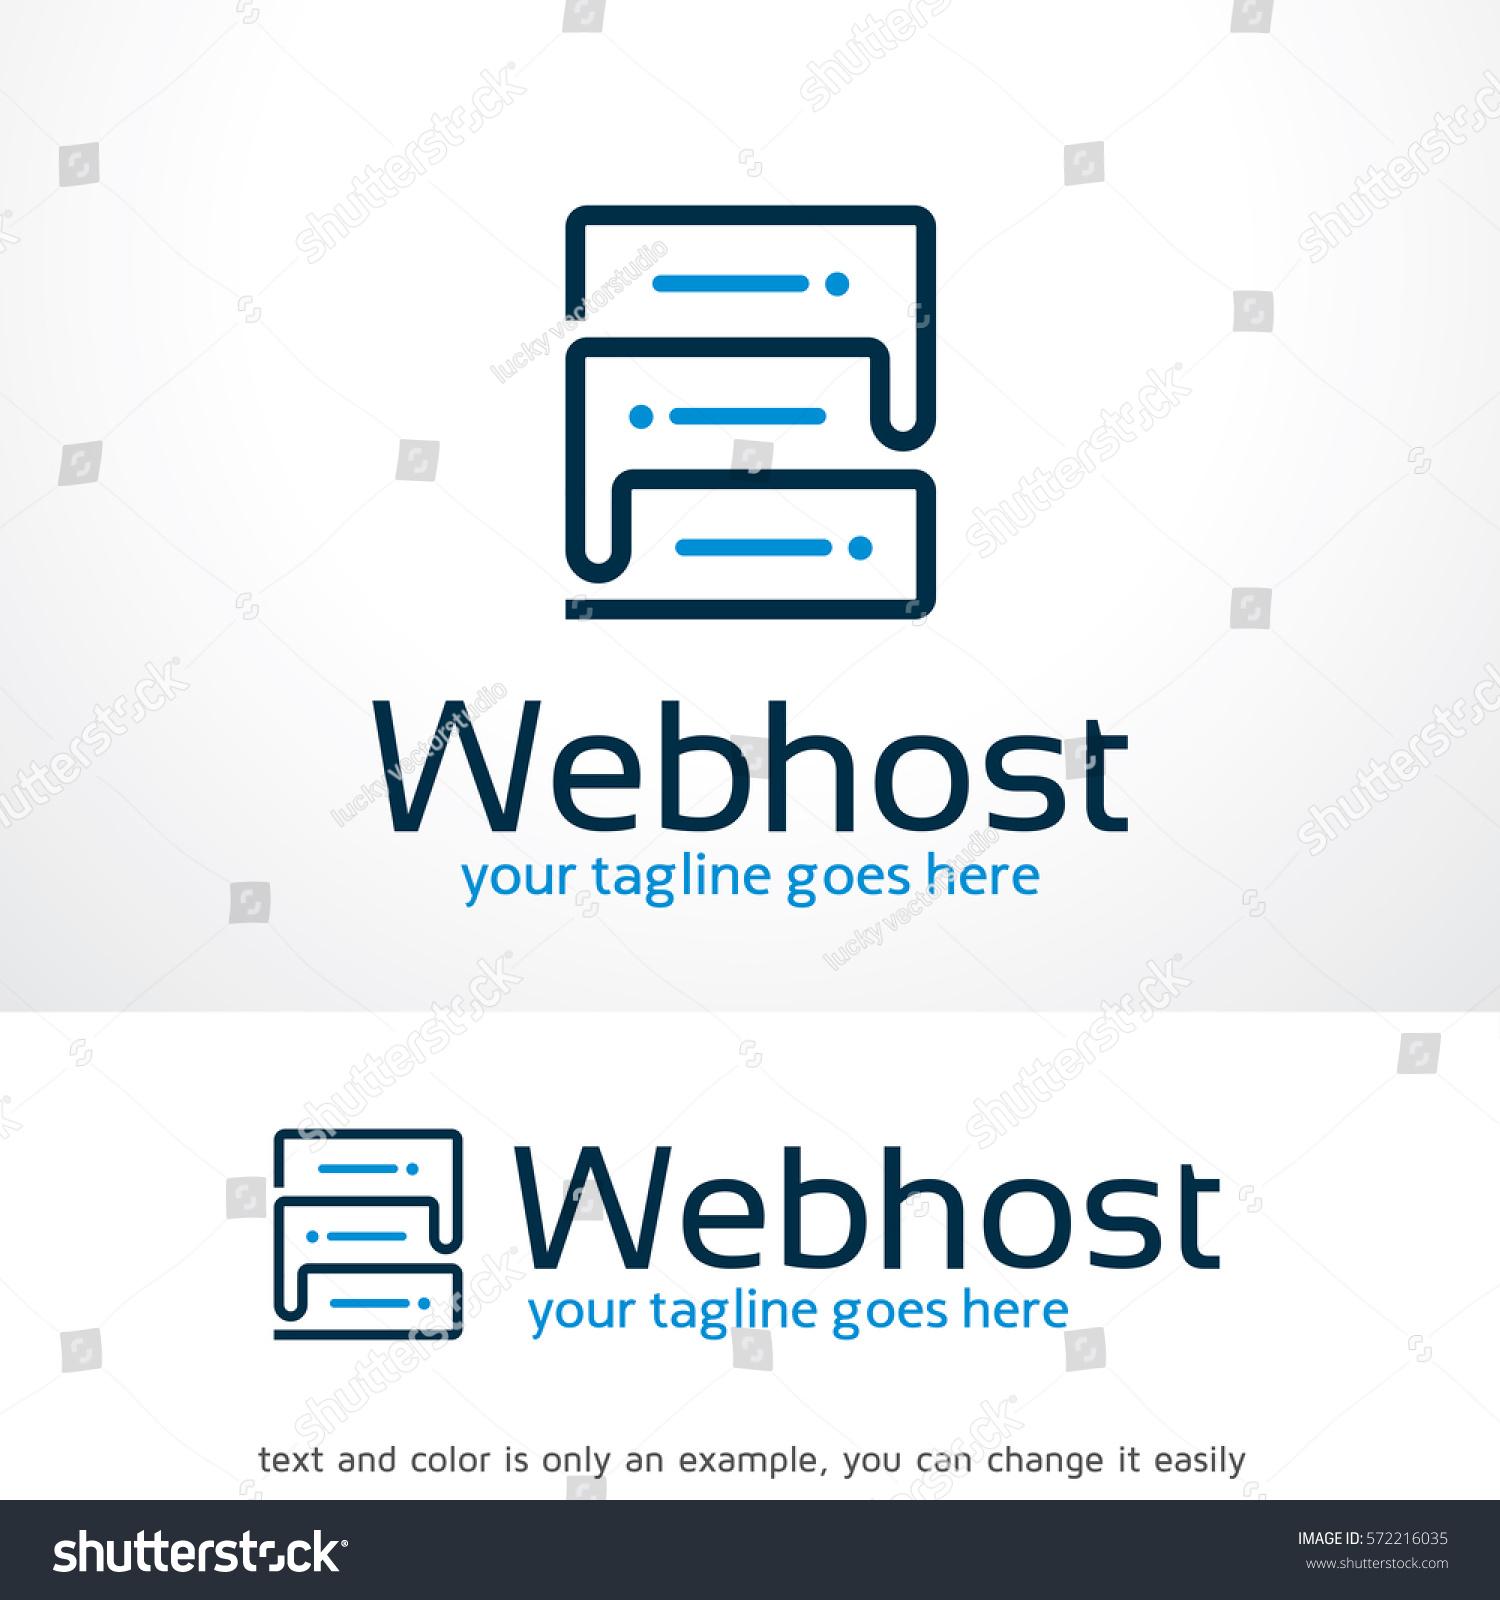 Web Hosting Logo Template Design Vector Stock-Vektorgrafik 572216035 ...